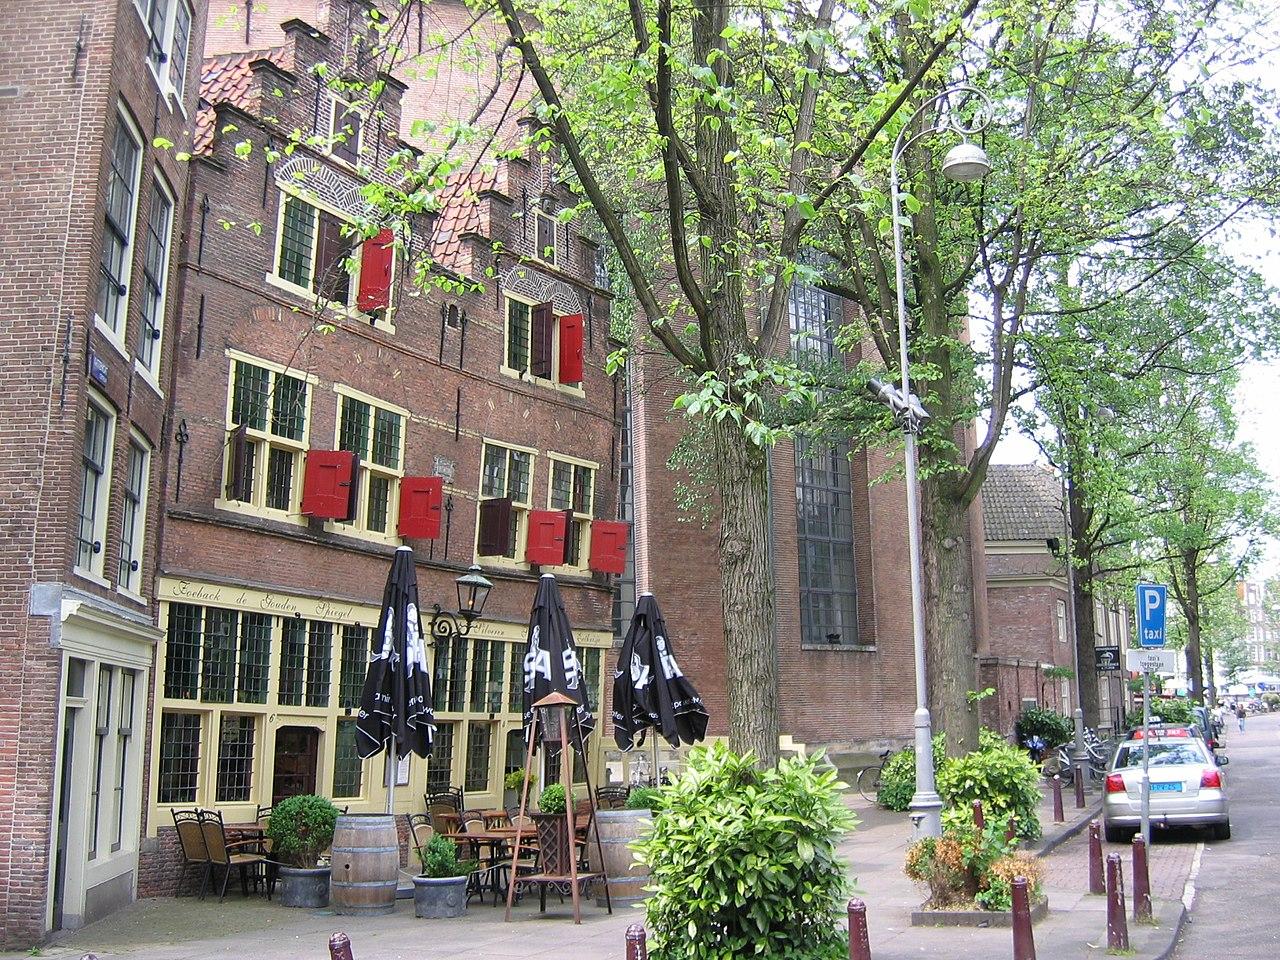 file wlm minke wagenaar renaissance amsterdam hotel. Black Bedroom Furniture Sets. Home Design Ideas